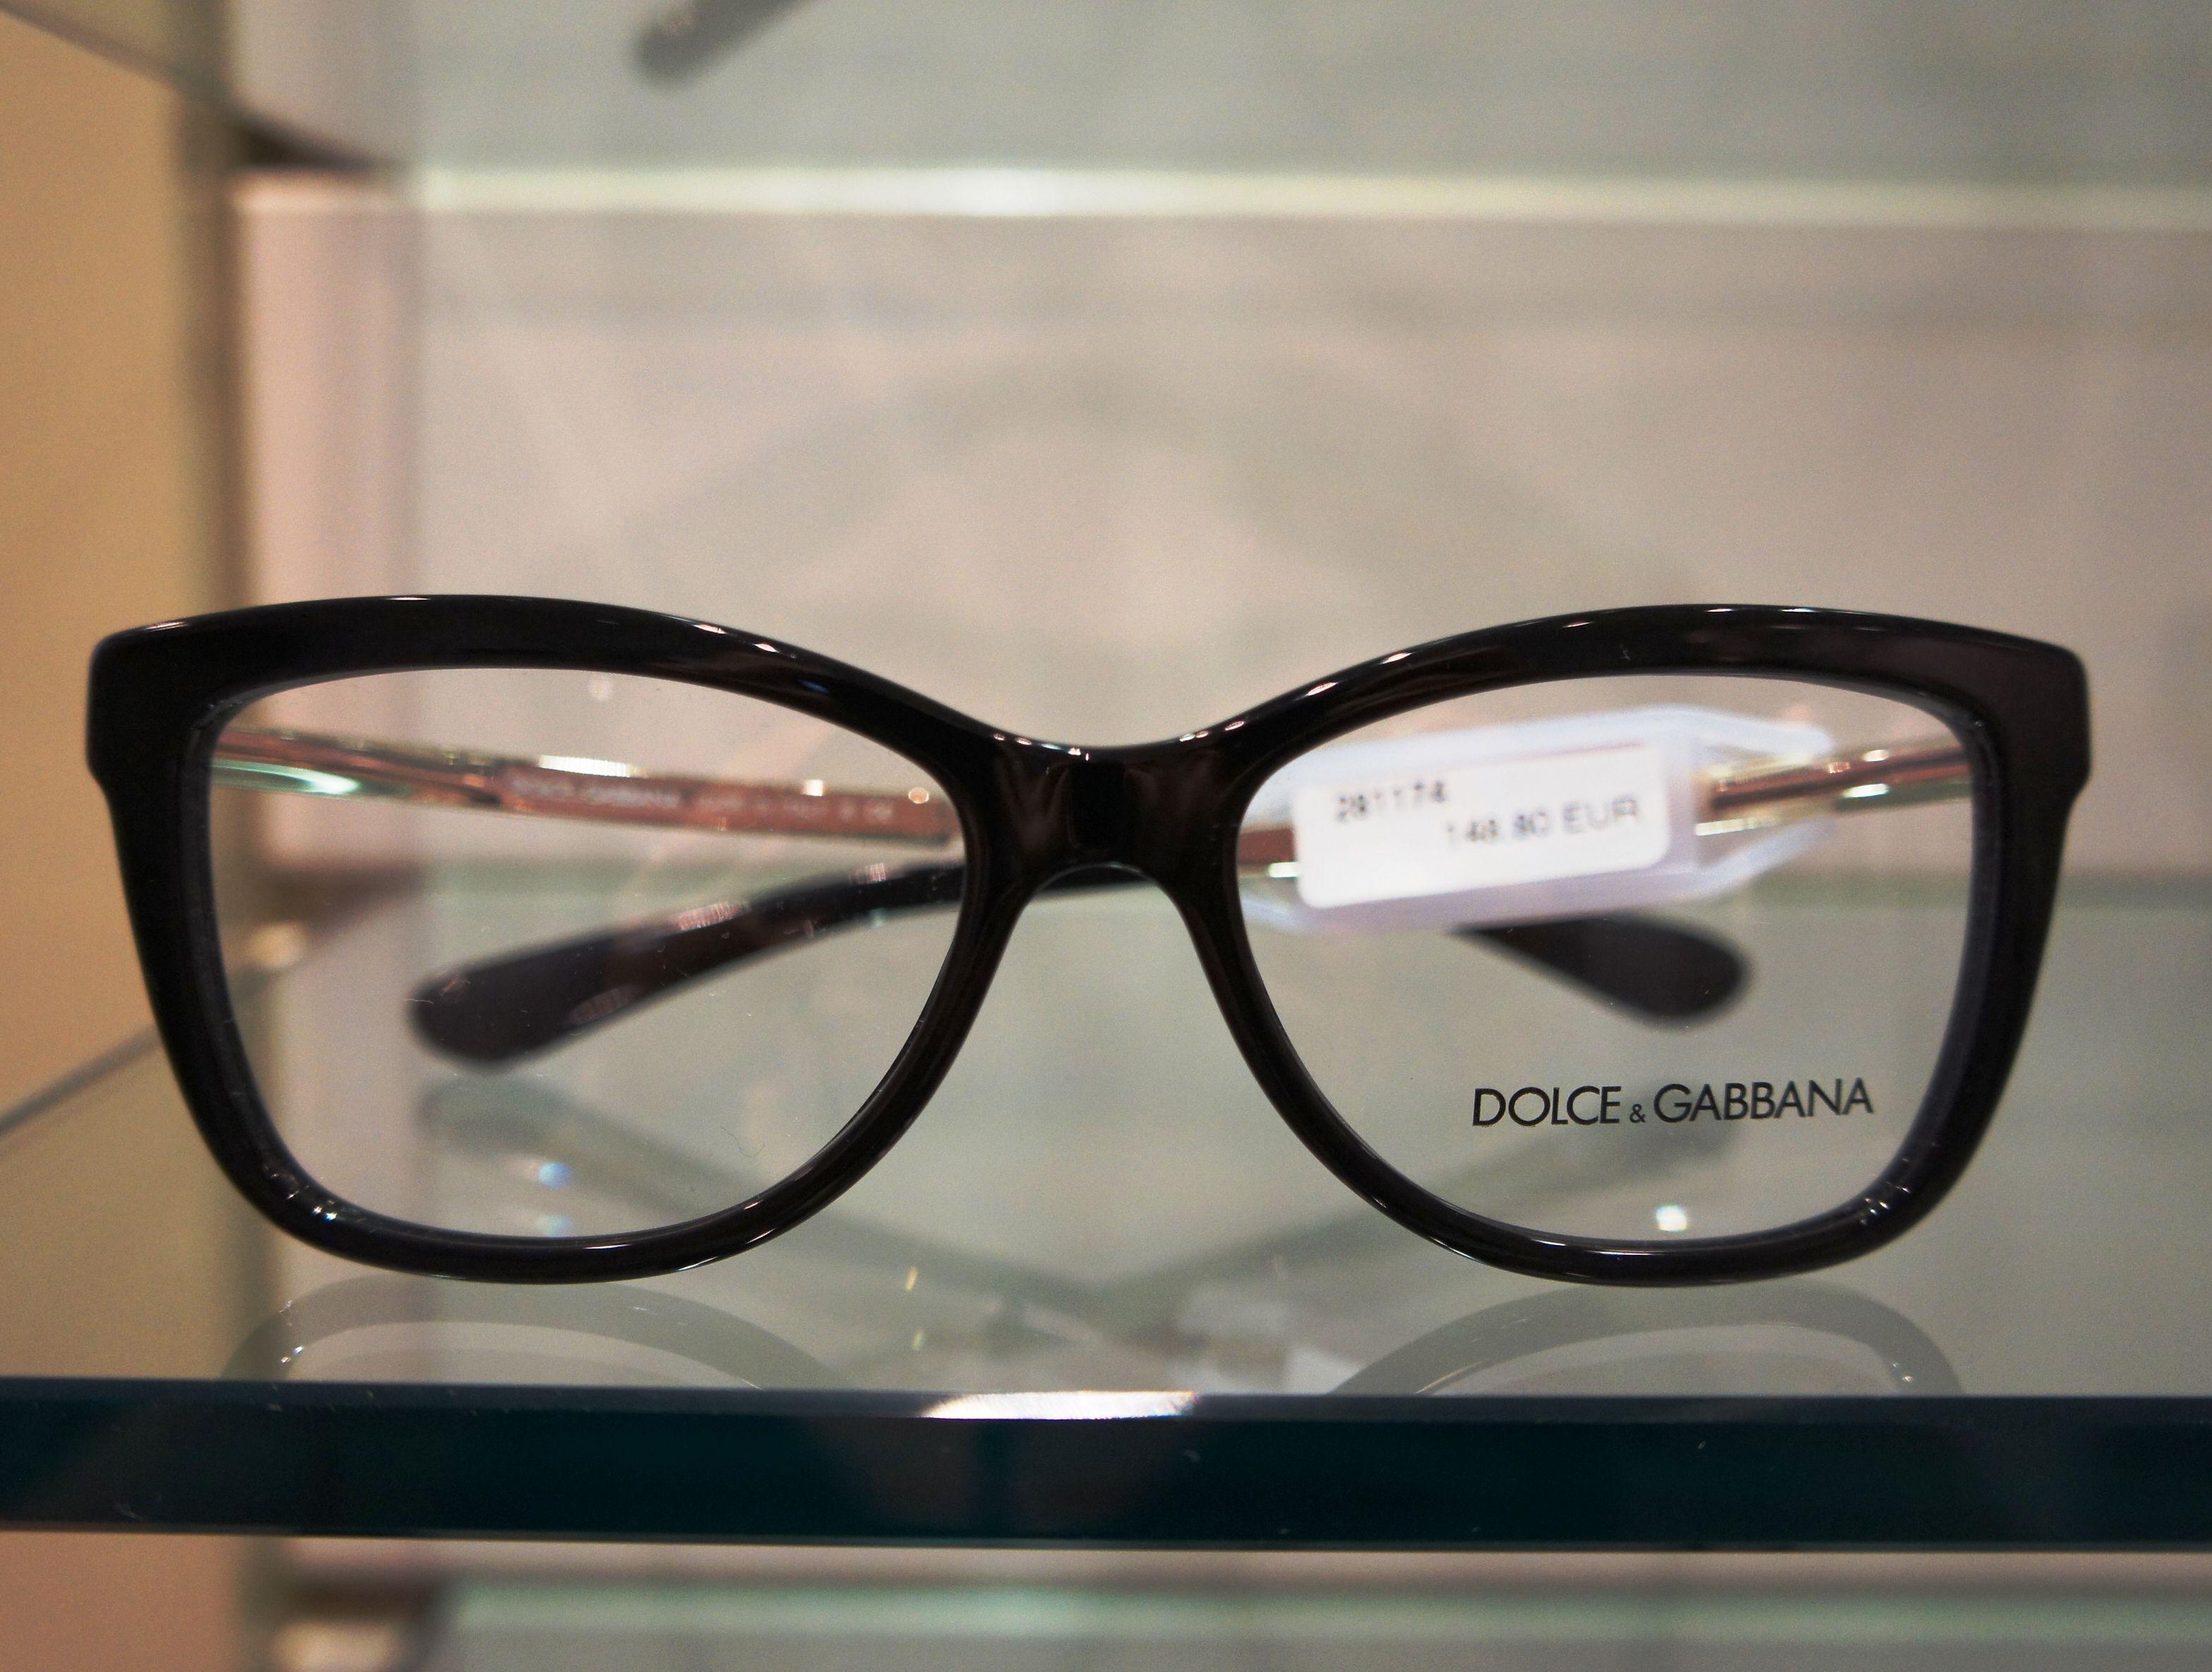 Dolce Gabbana DG 3218 501   The Frames   Eyeglasses, Glasses, Sexy 35228aaf9983